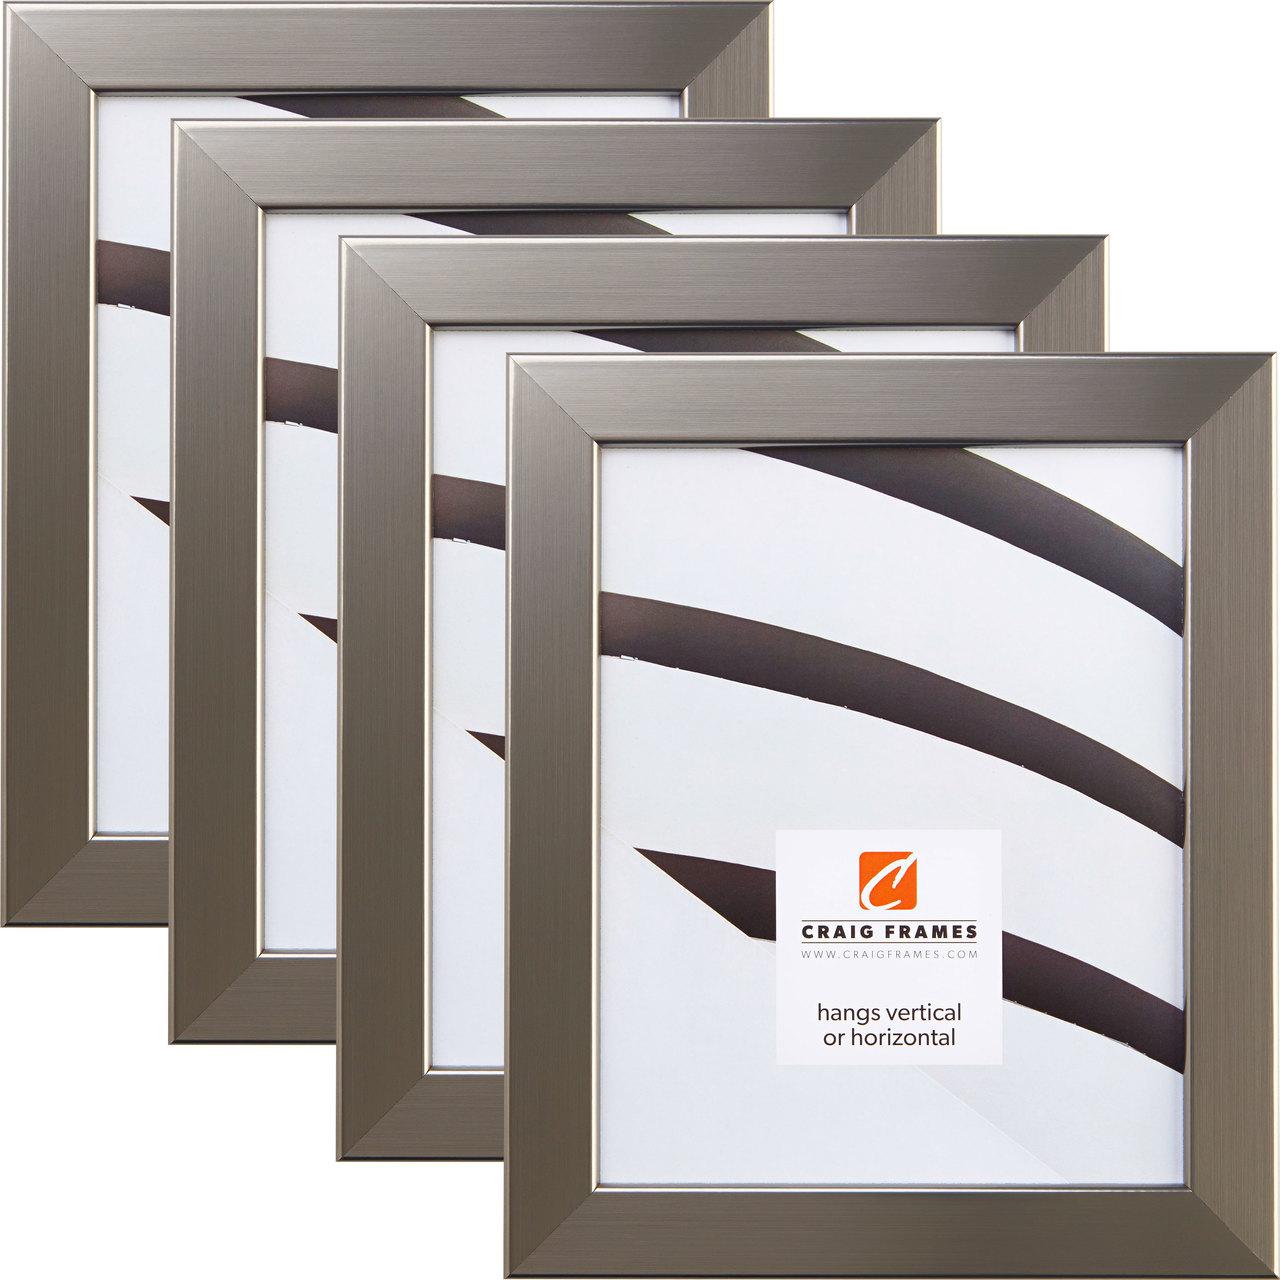 Bauhaus 125 Modern Silver Picture Frame 4 Pack - Craig Frames